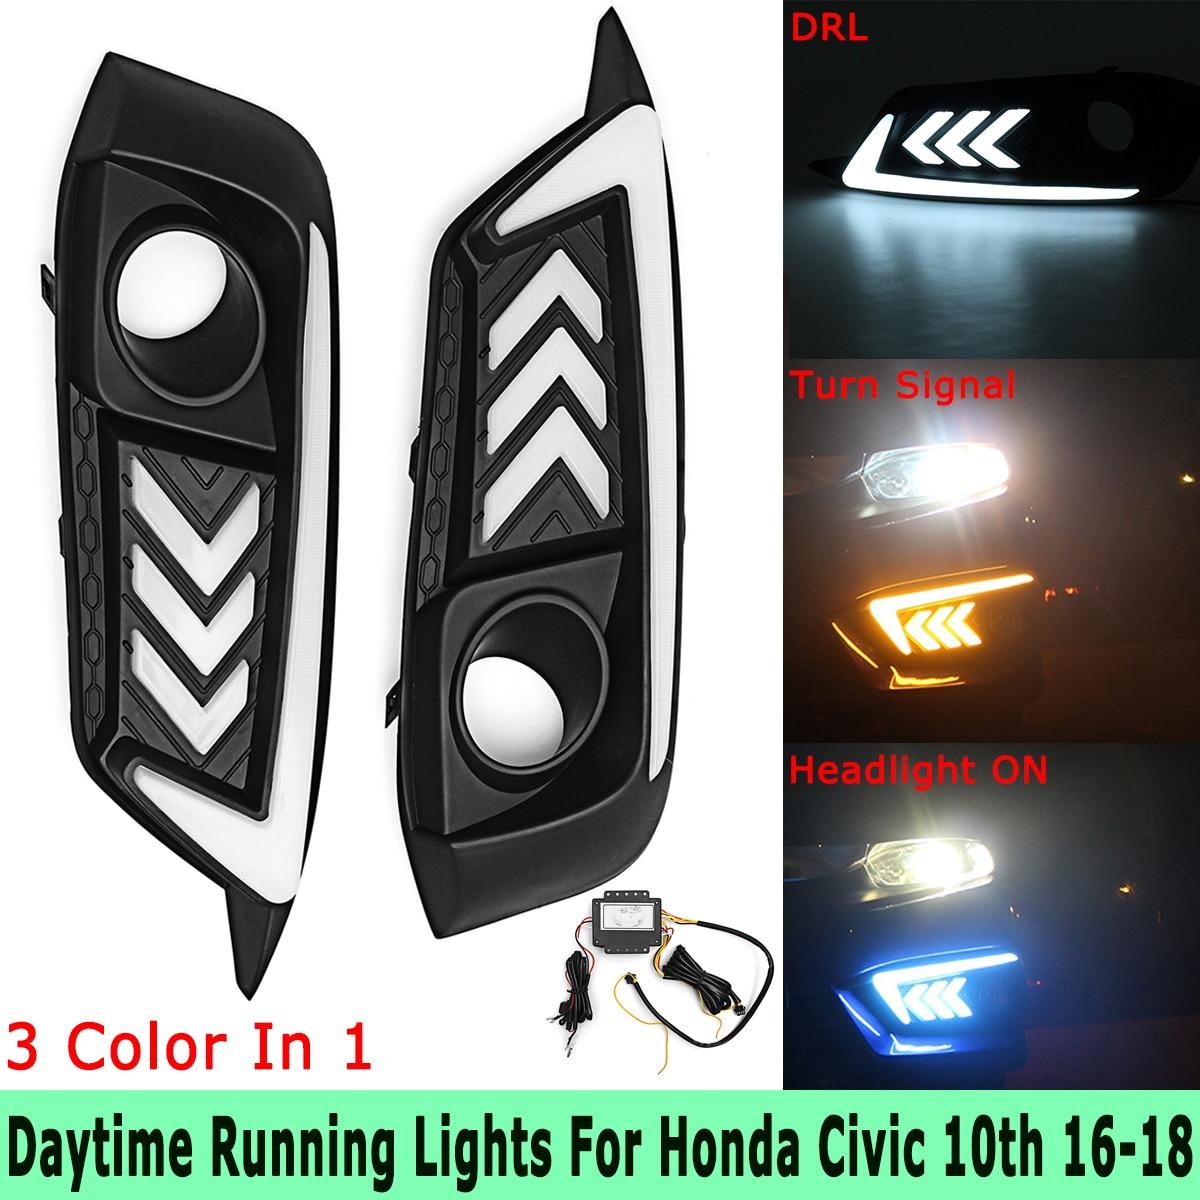 Blue White Yellow LED DRL Headlight Daytime Running Lamps Turn Signal Fog Lights for Honda for Civic 10th 2016 2017 2018 цена